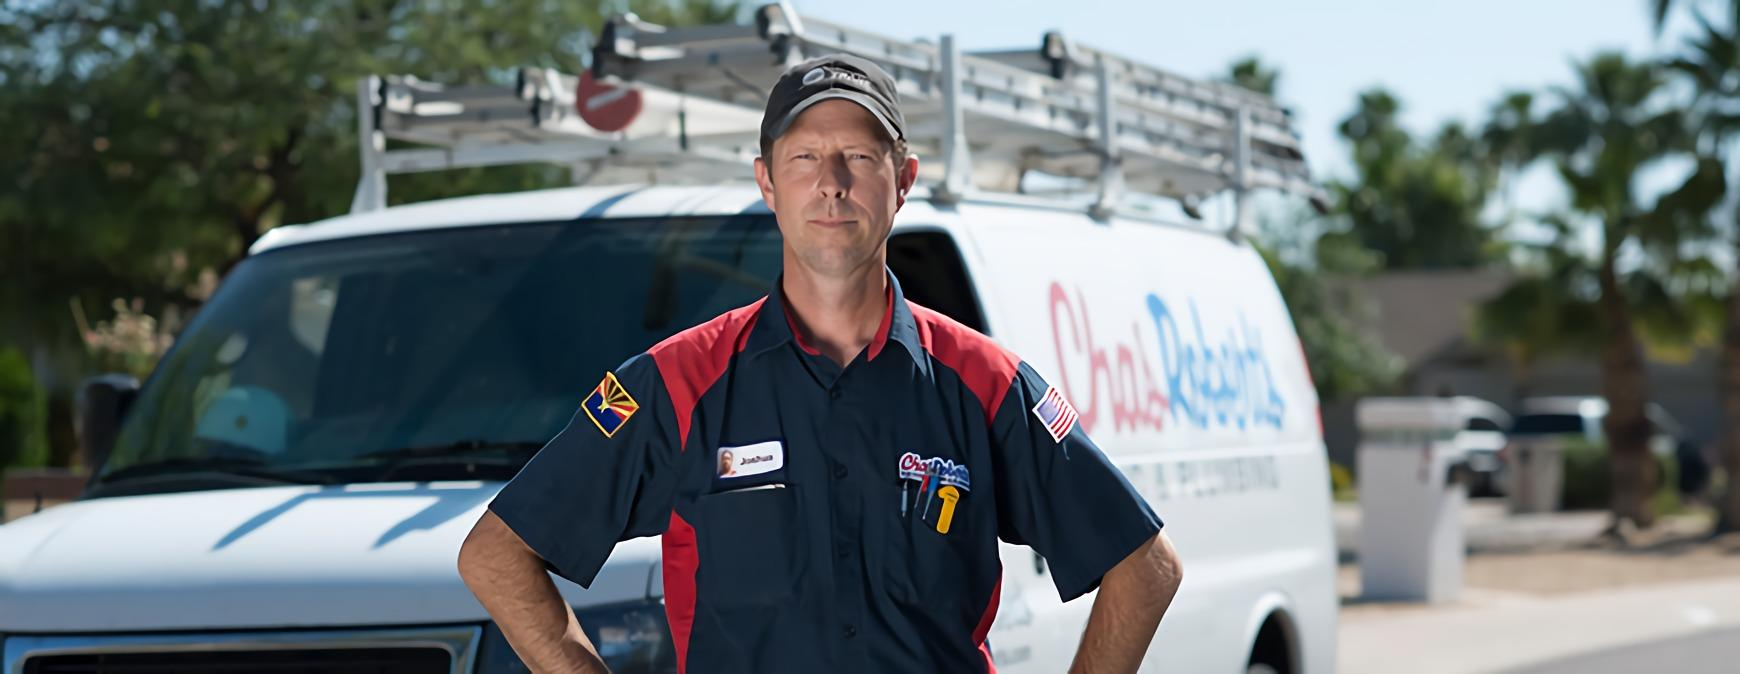 hvac business owner in front of van